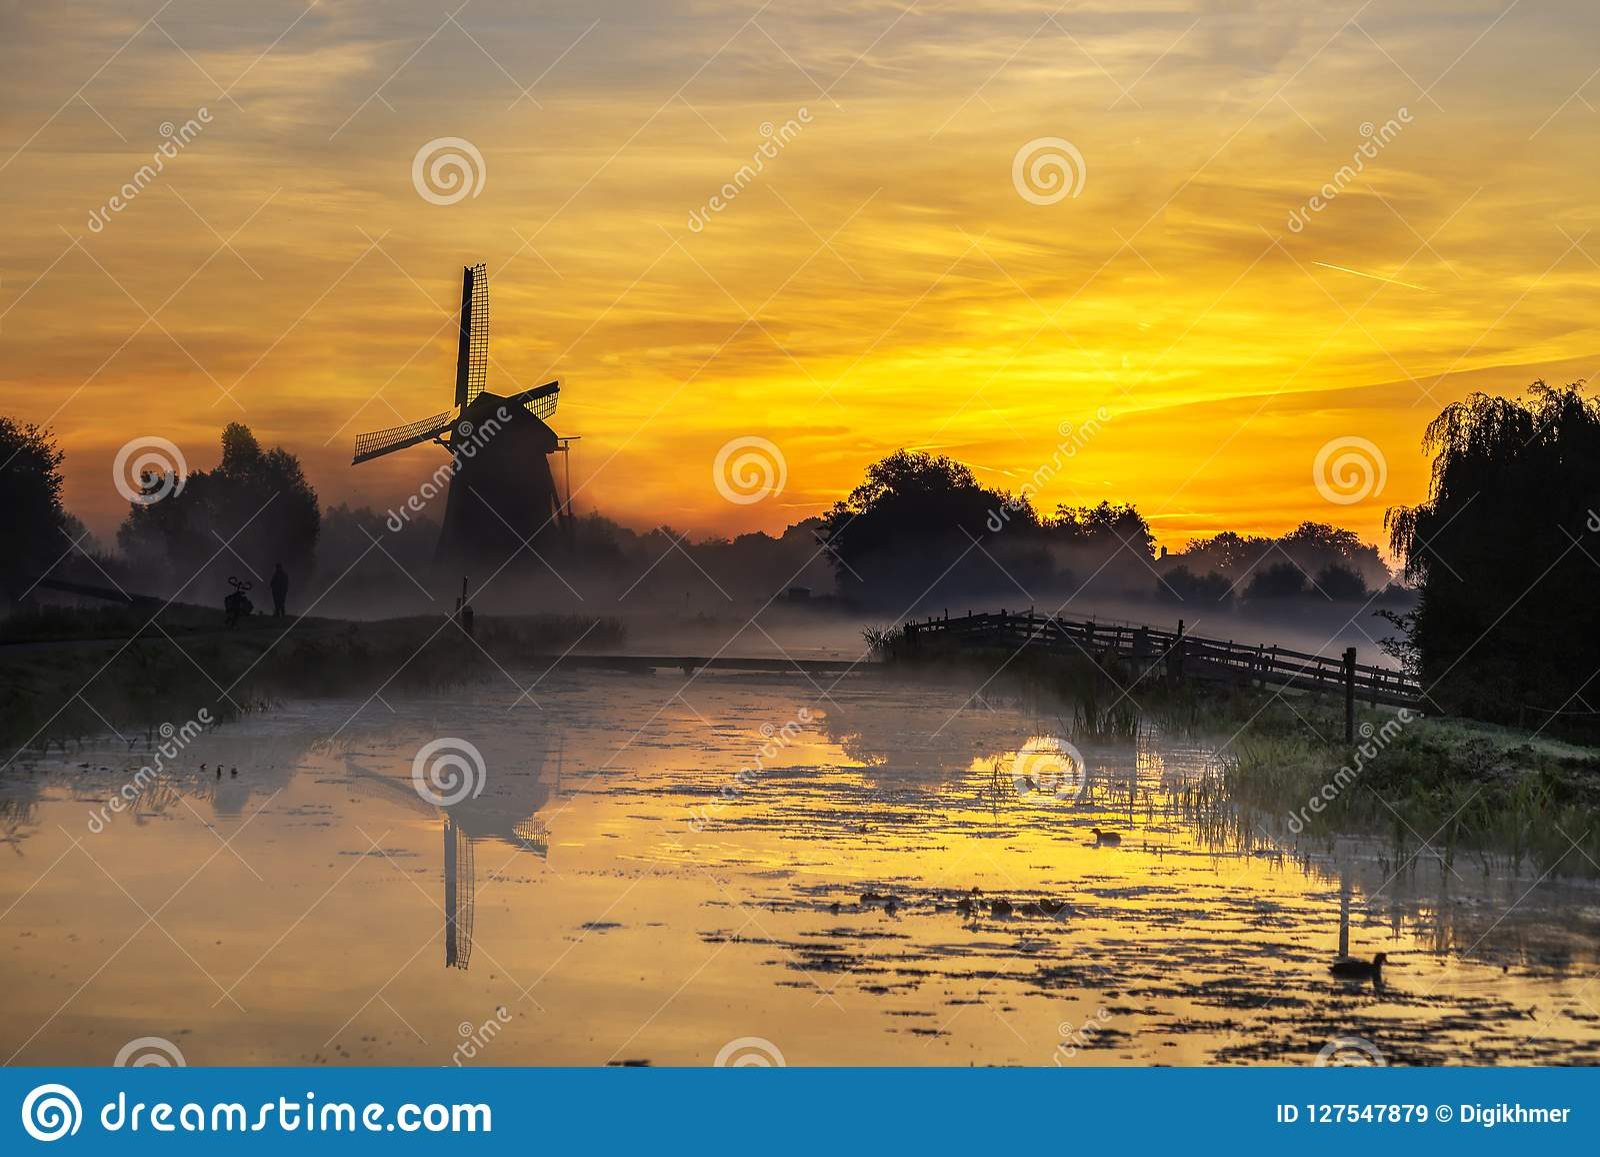 Sunrise on the Dutch windmill